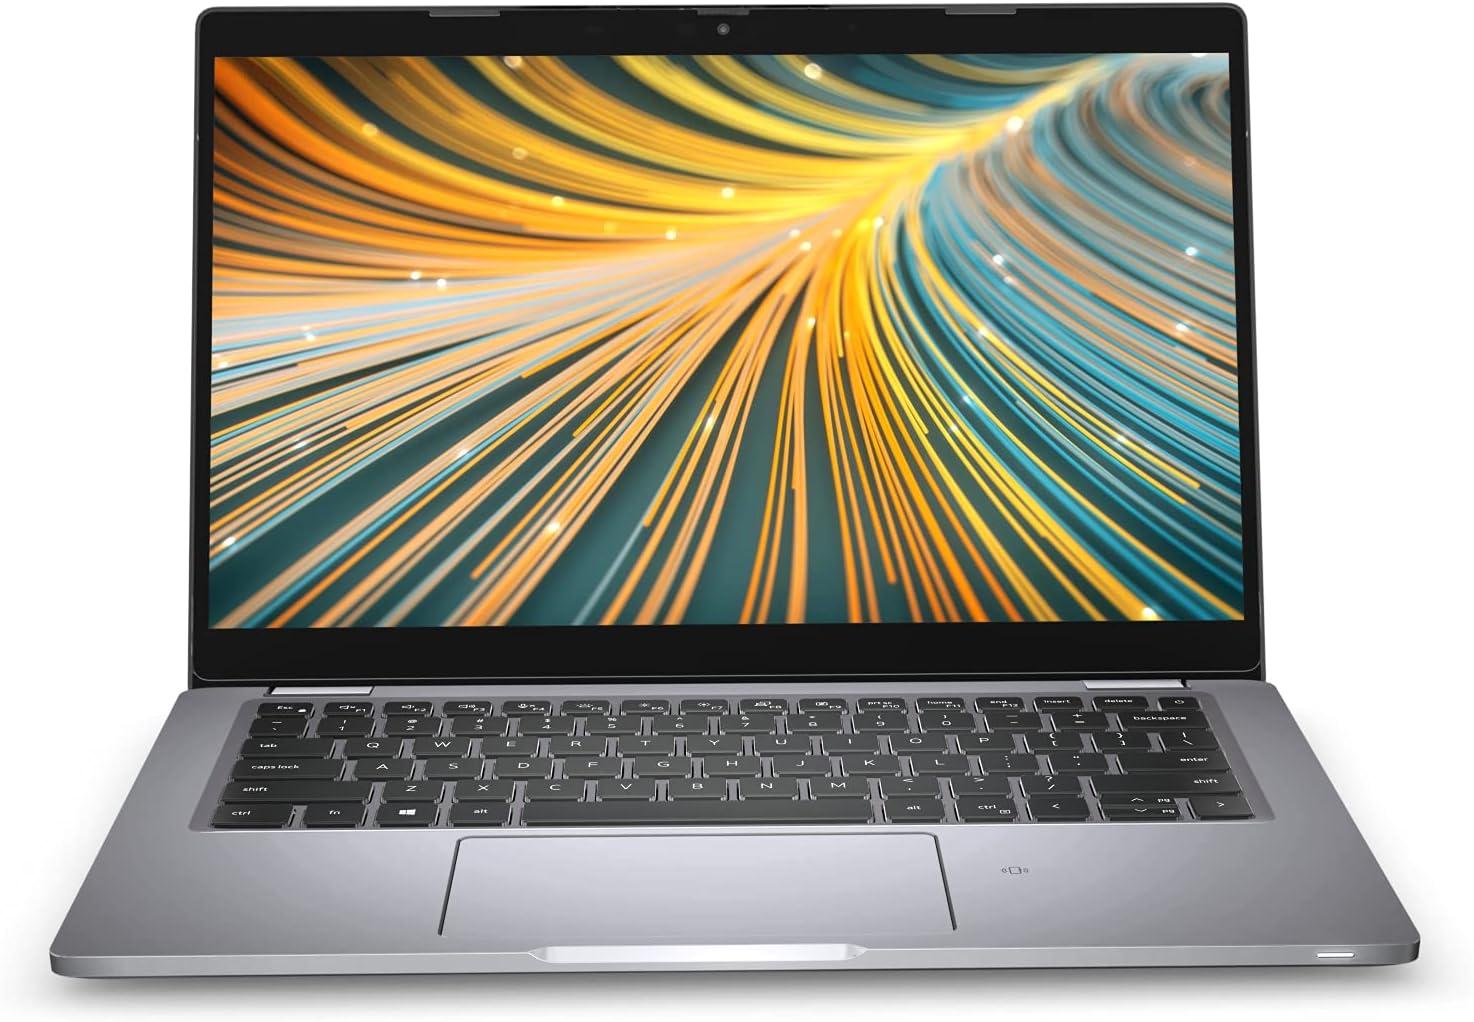 Dell 5320 Laptop 13 512GB SSD 16GB Ram Laptop